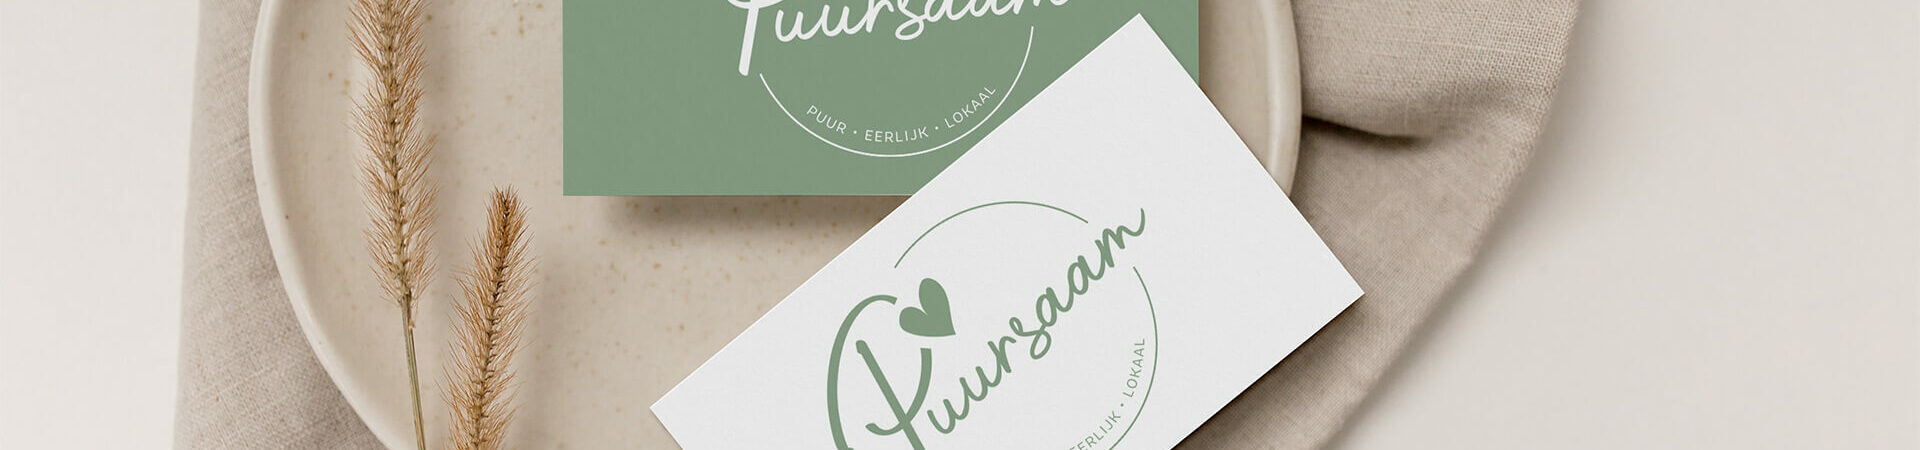 Branding: Puursaam | Eunoia Studio